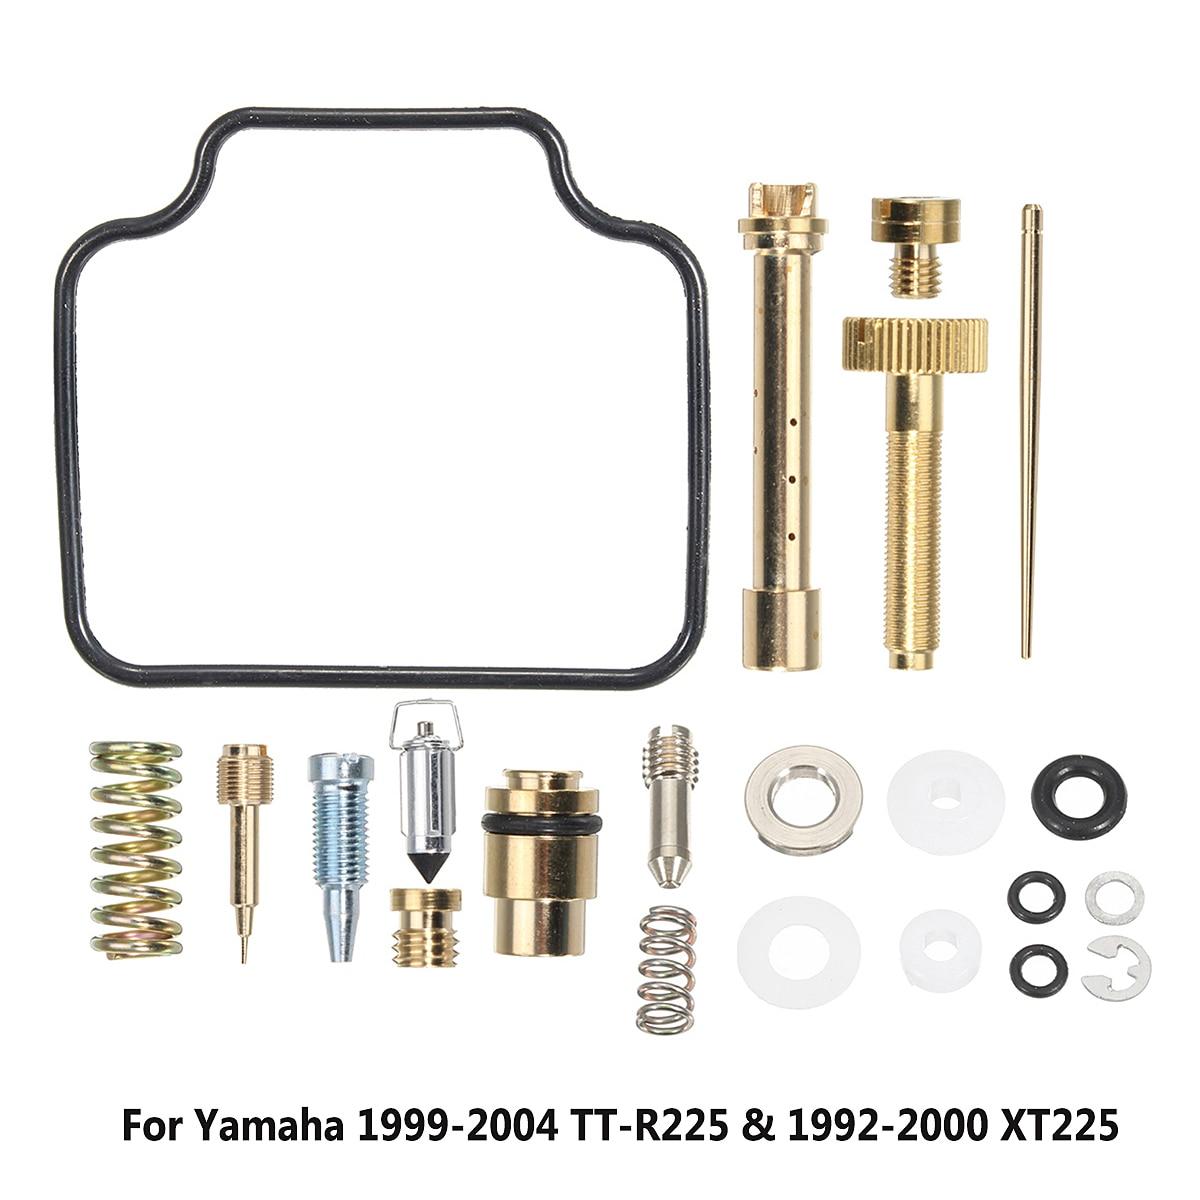 Vergaser Carb Rebuild Kit Fit für Yamaha 1999-2004 TT-R225 & 1992-2000 XT225